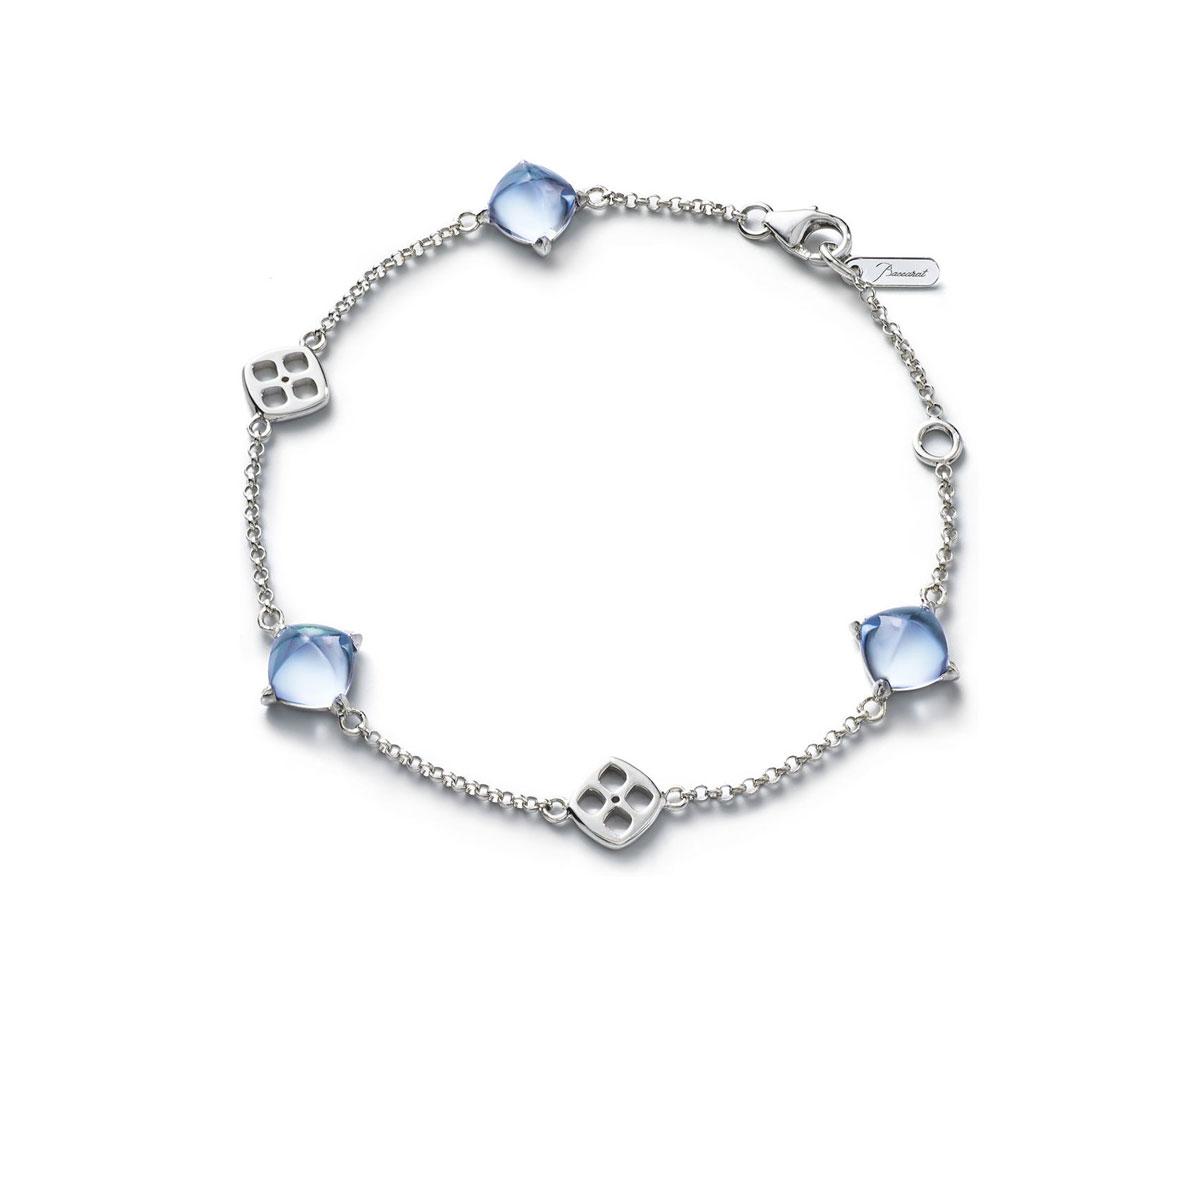 Baccarat Crystal Medicis Mini Chain Bracelet Sterling Silver Aqua